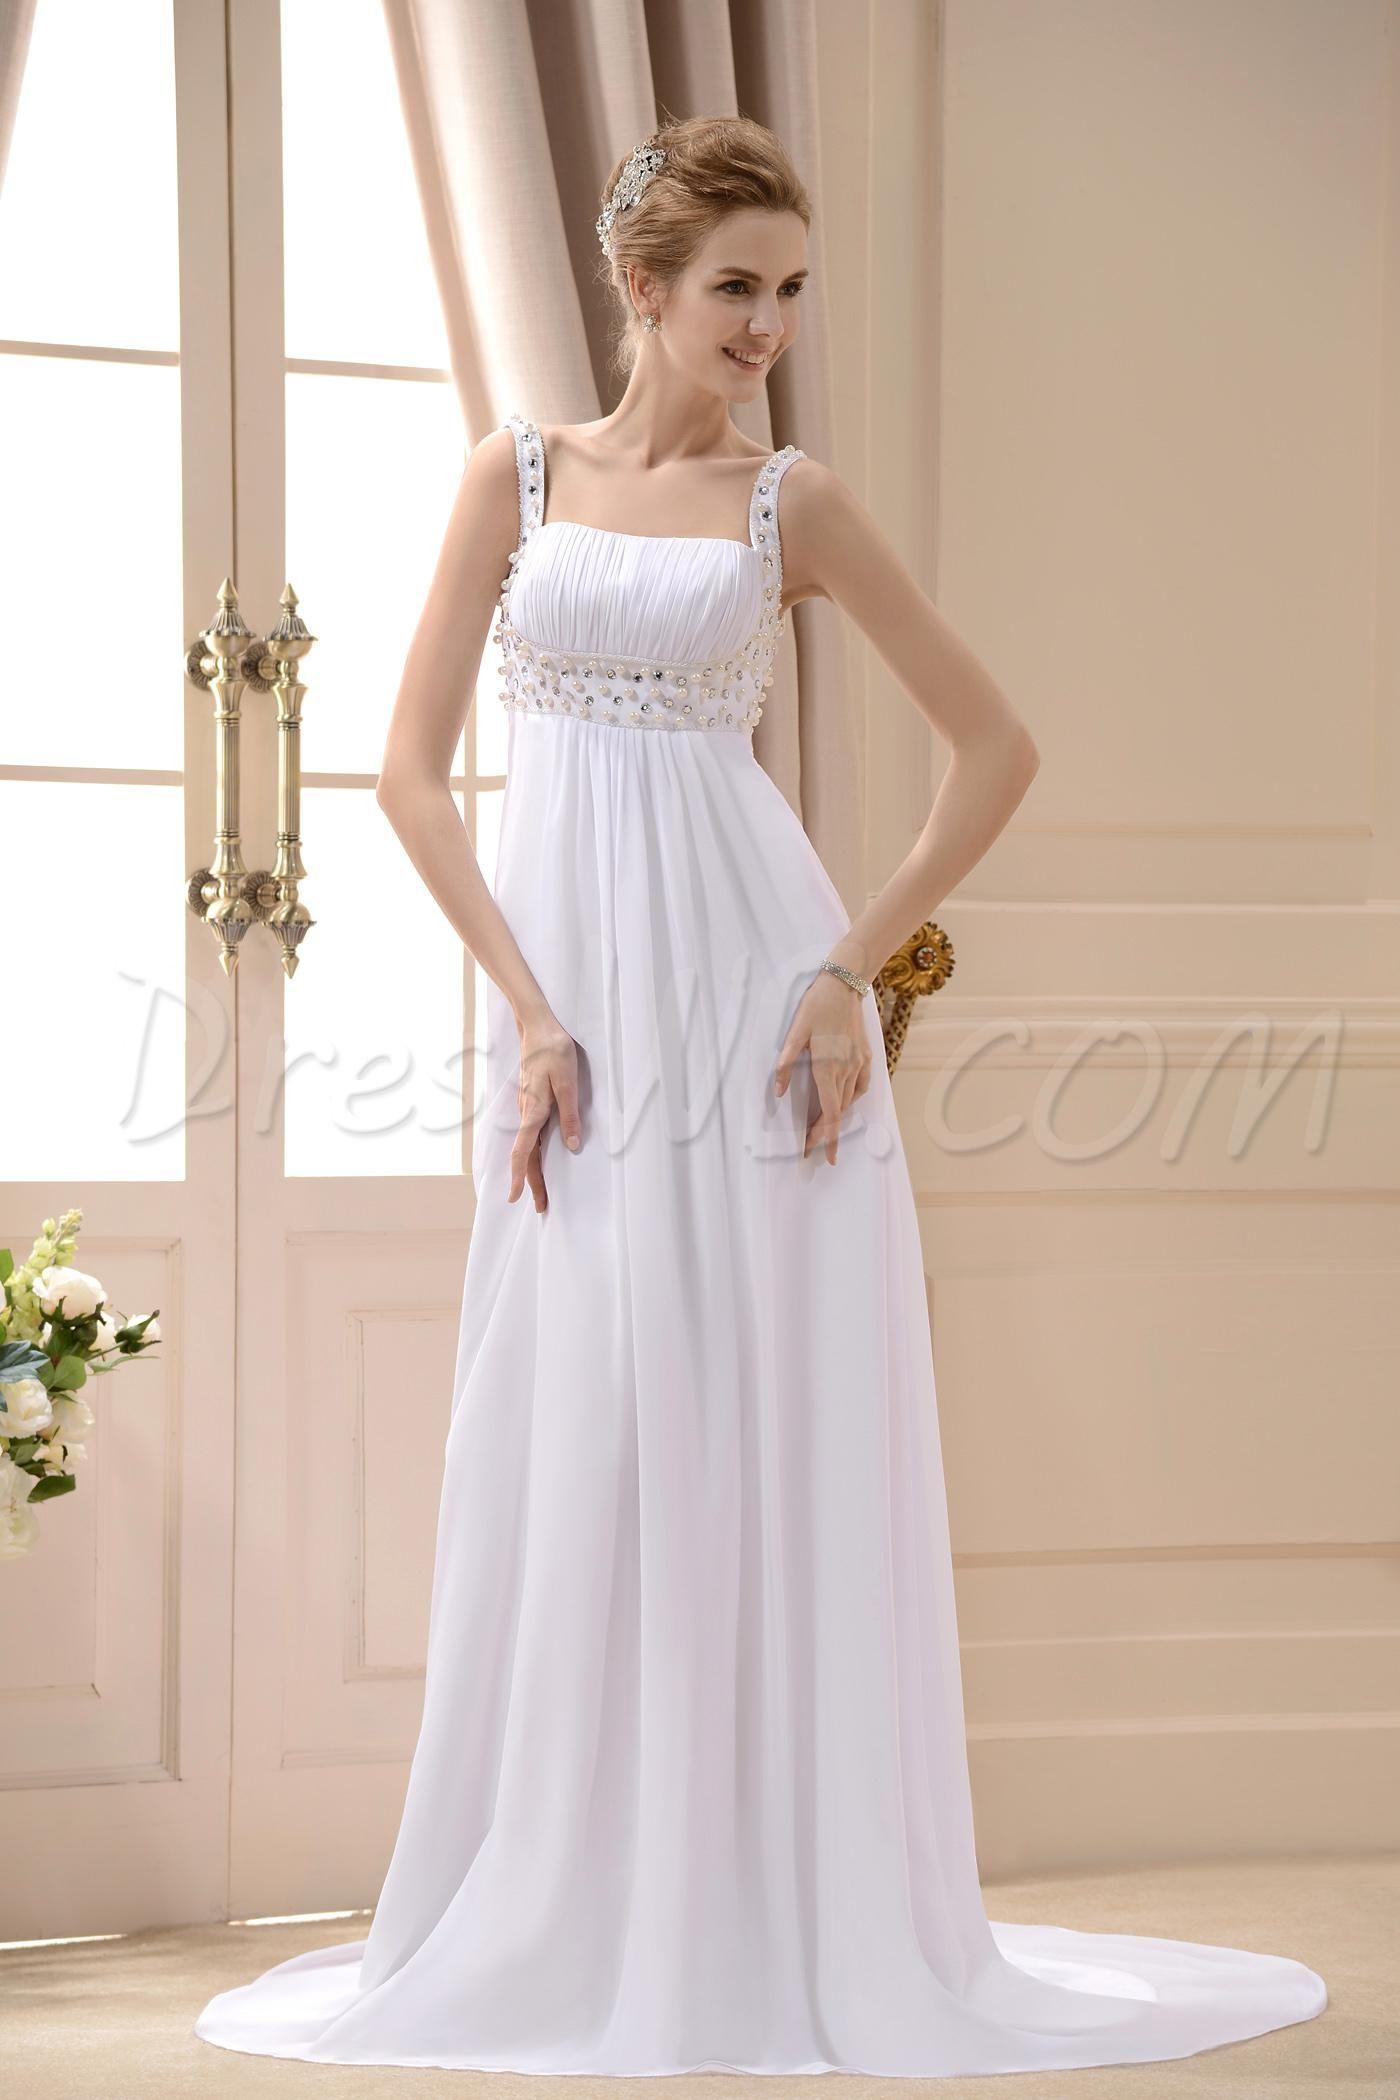 $145.79 Dresswe.comサプライ品エレガントな帝国チャペルの列車のウェディングドレス スパゲティストラップ